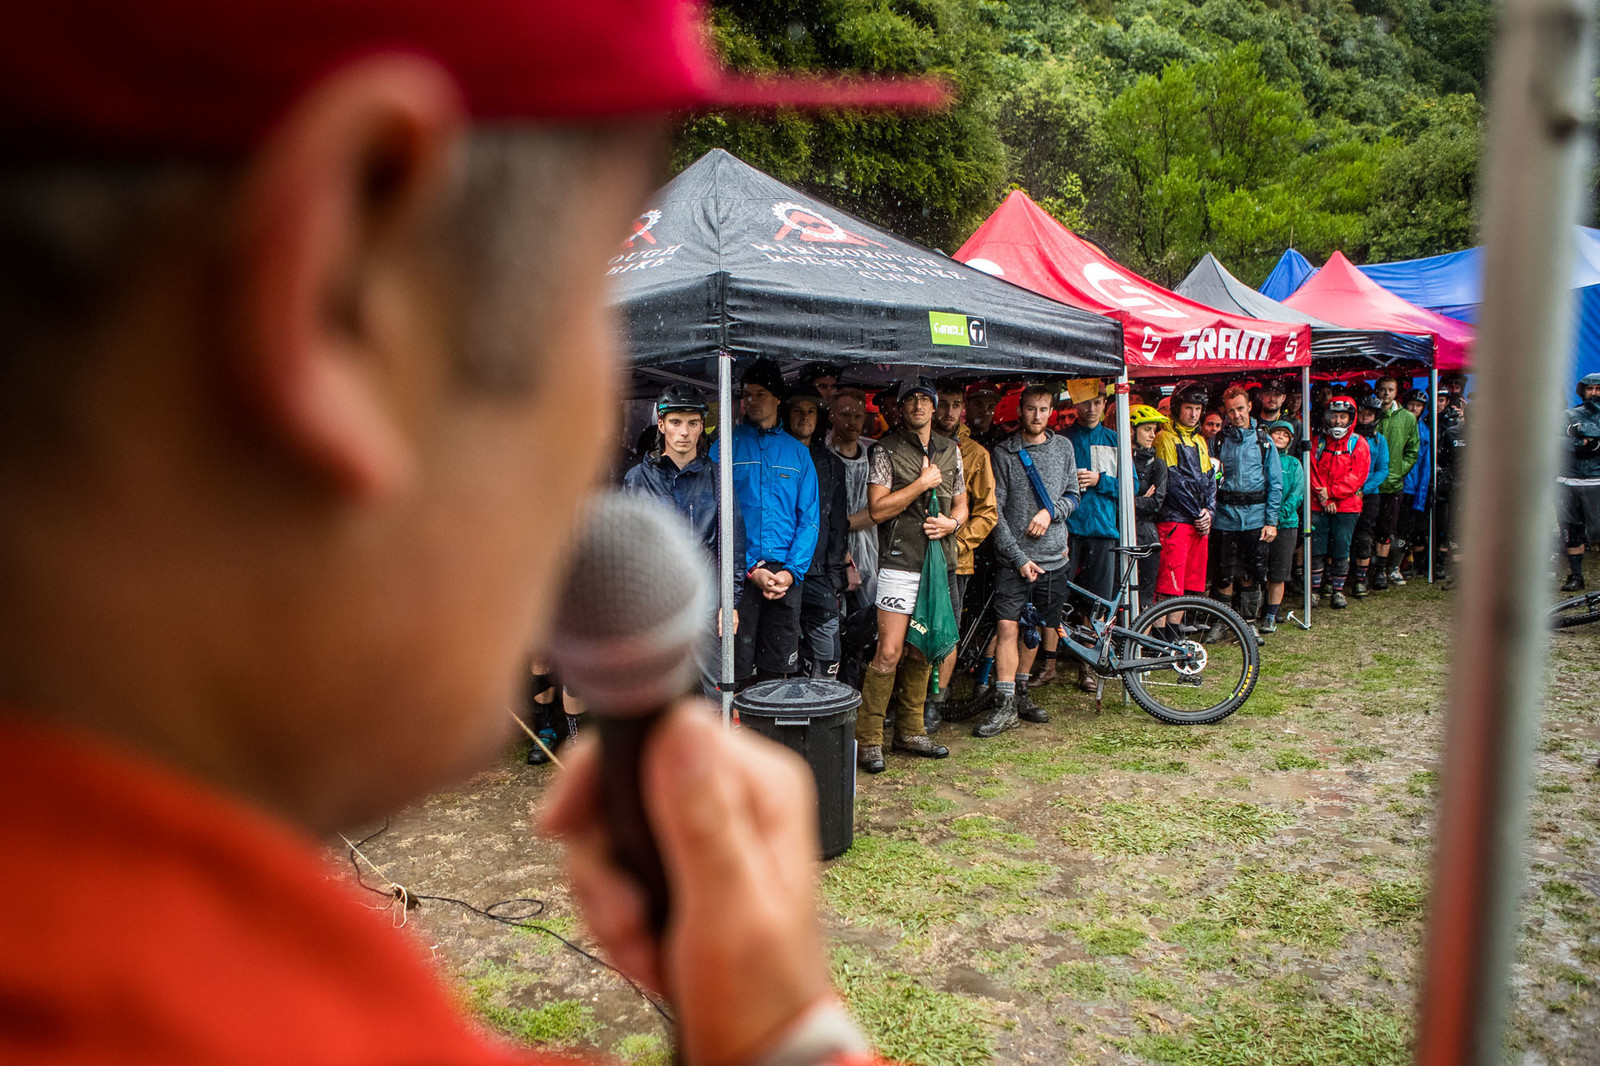 NZEnduro19 BB AS6I9529 - 2019 NZ Enduro Day 1 Photo Gallery - Mountain Biking Pictures - Vital MTB